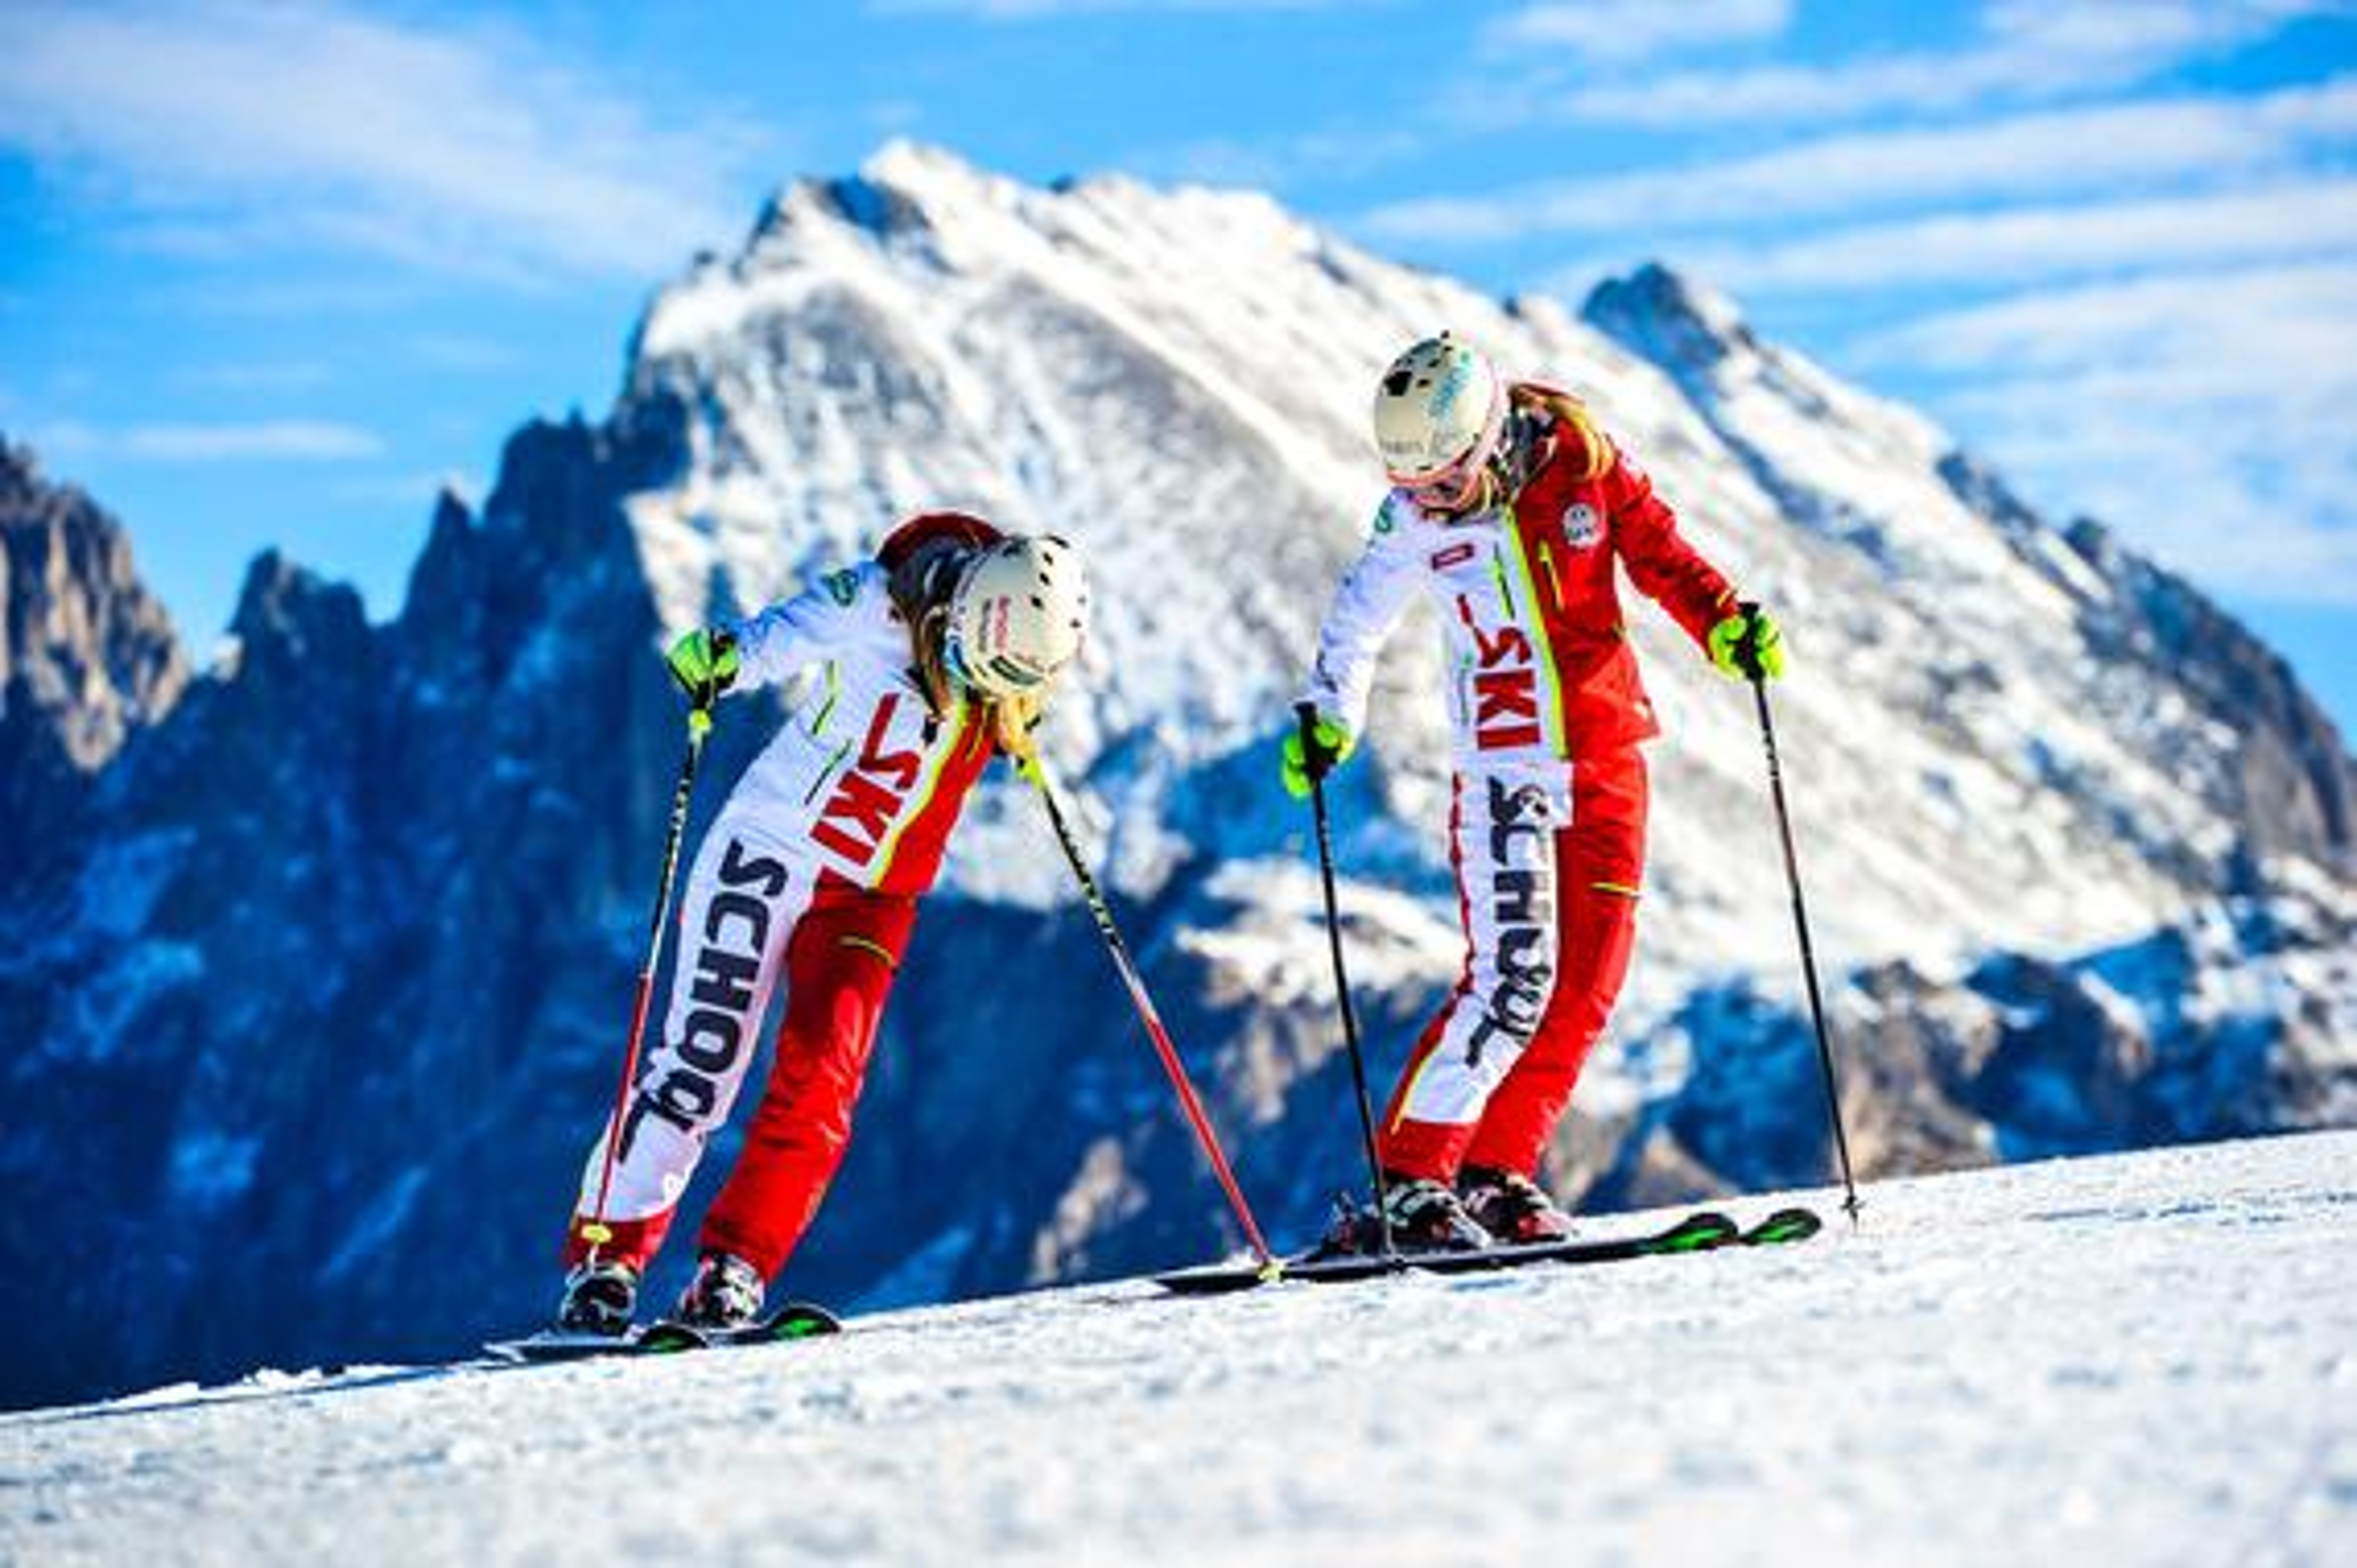 Skiguiding - Full Day